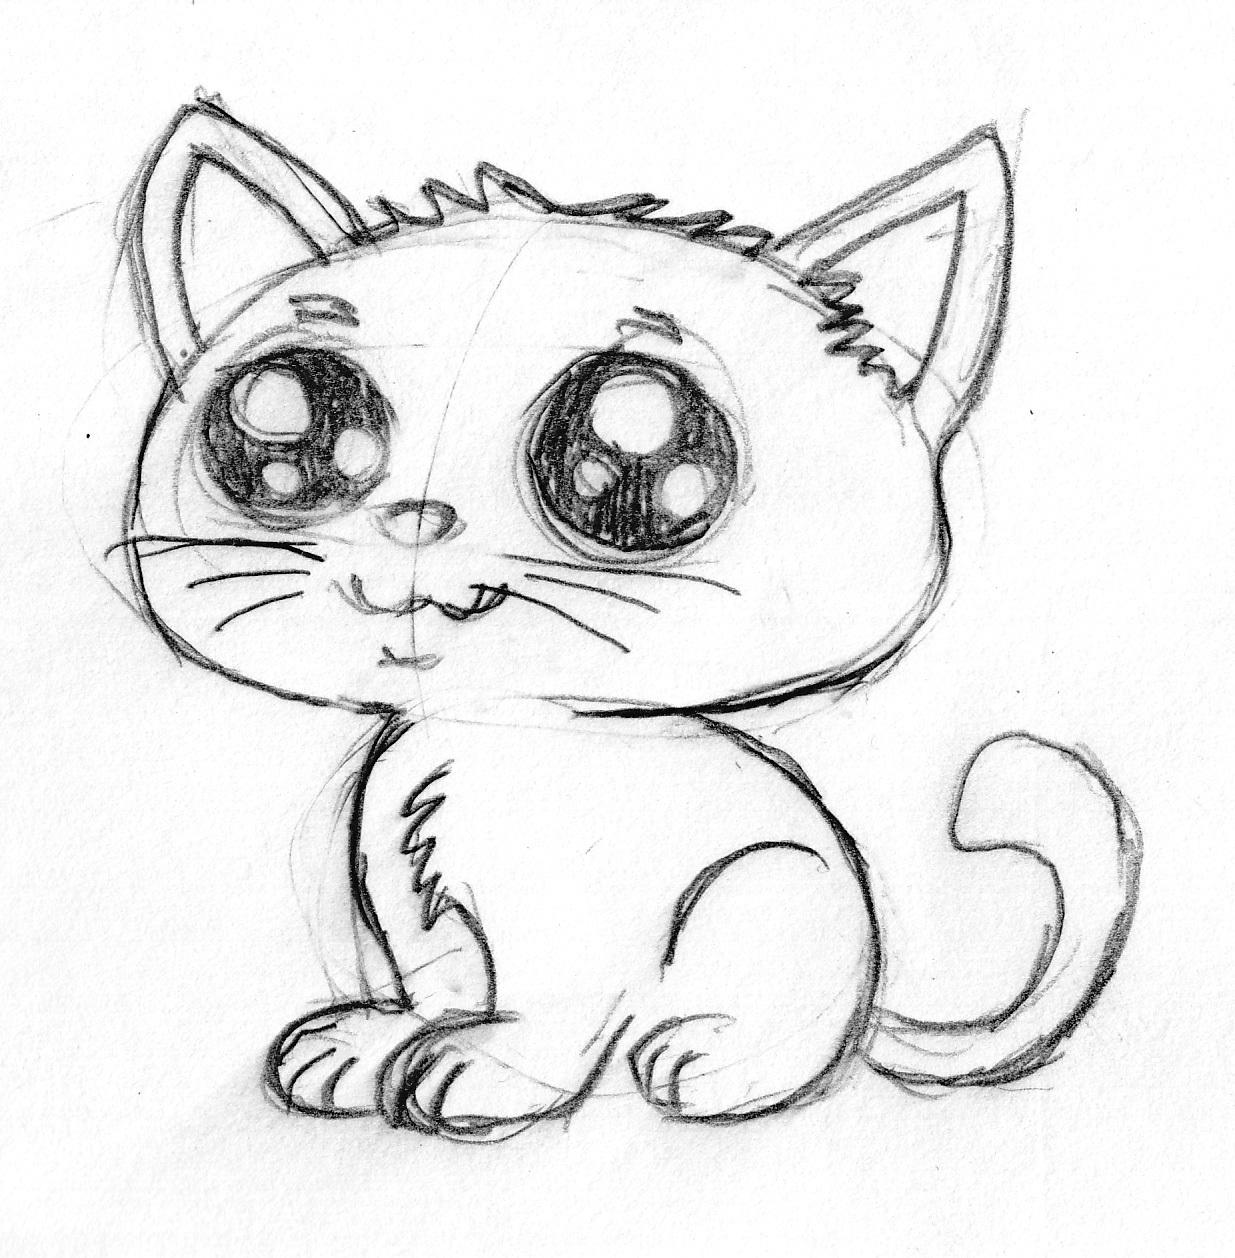 Image of: Illustration Bhudda Cute Cartoon Kitten 0c5f017a Ku78 Bhudda Cgsociety Cute Cartoon Kitten Pencil Sketch By Bhudda 2d Cgsociety